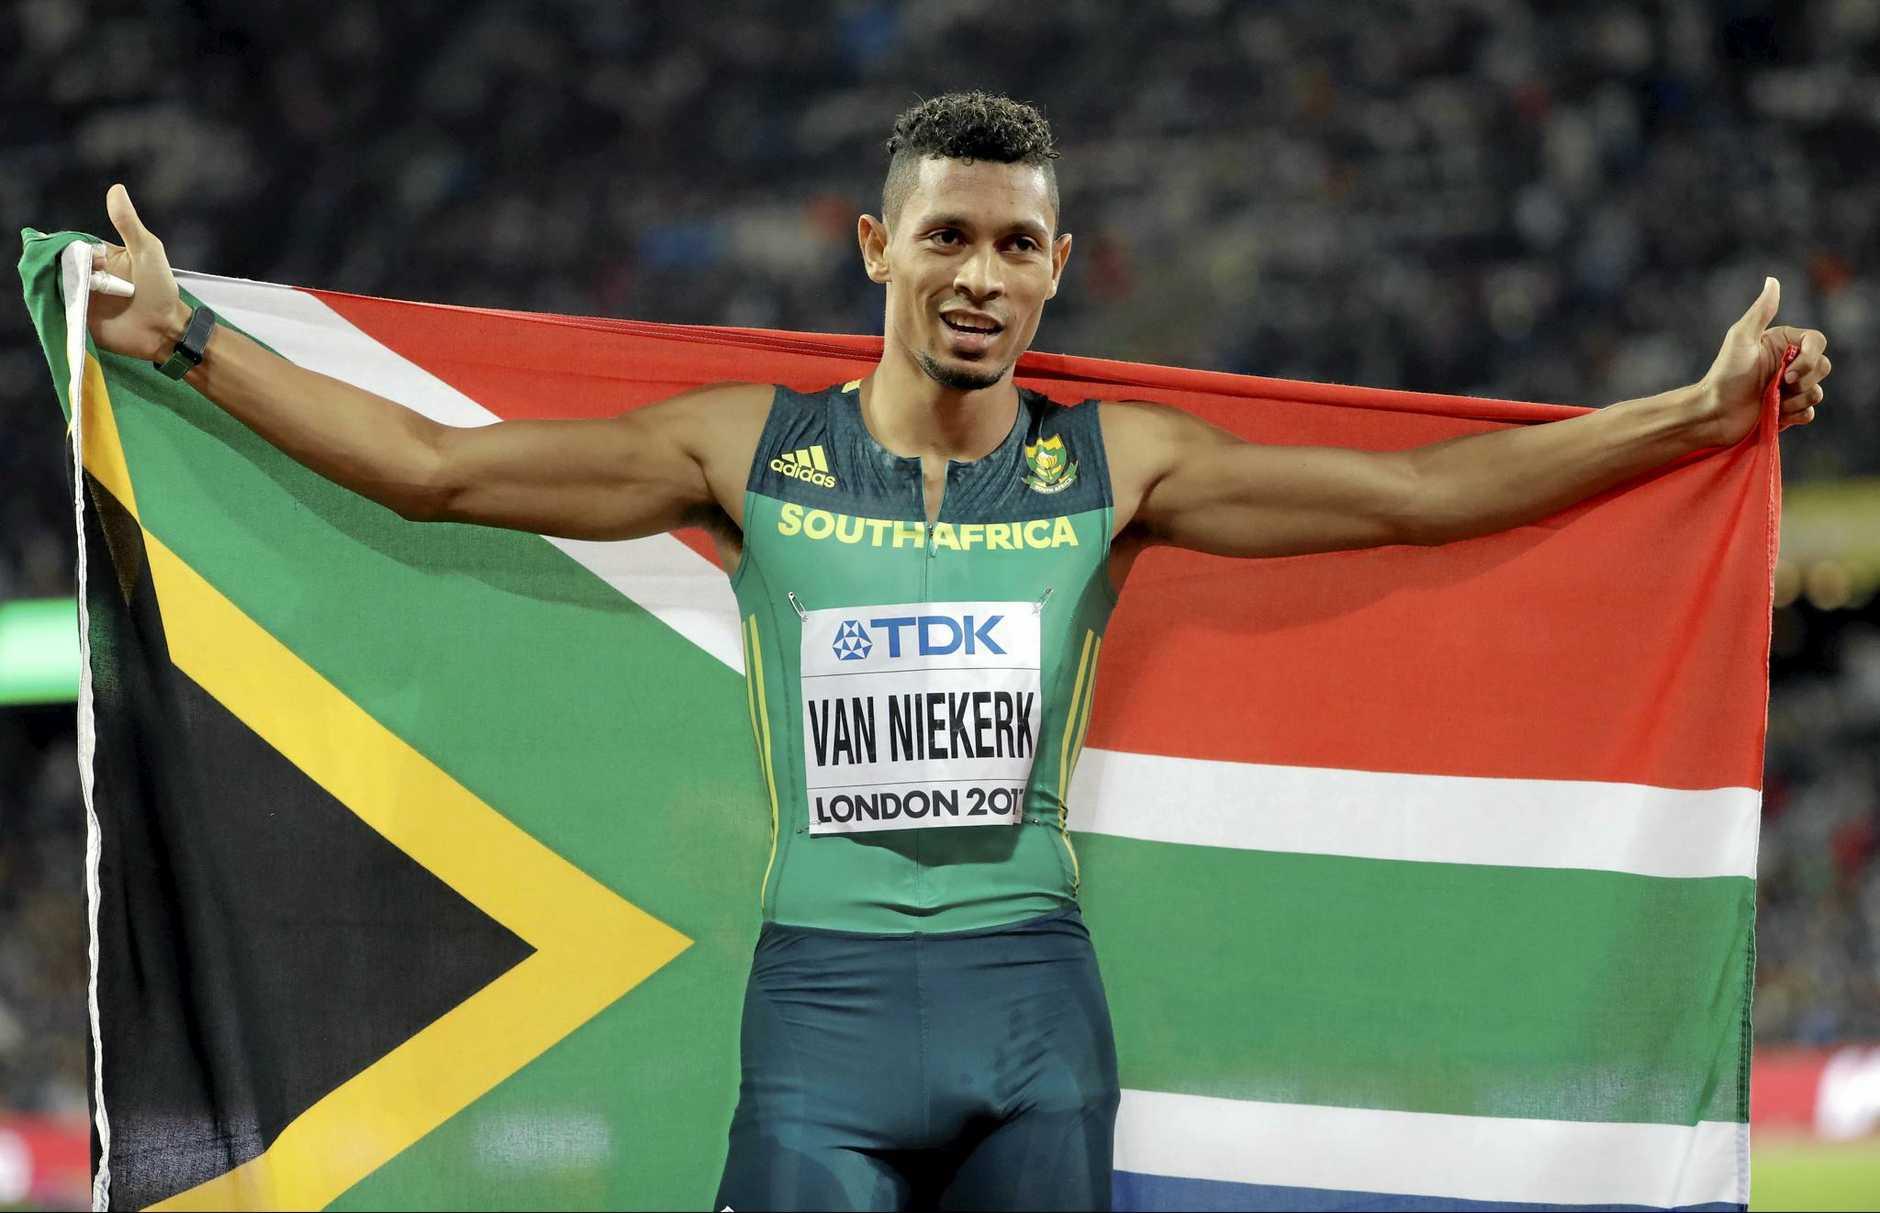 Van Niekerk celebrates winning the gold